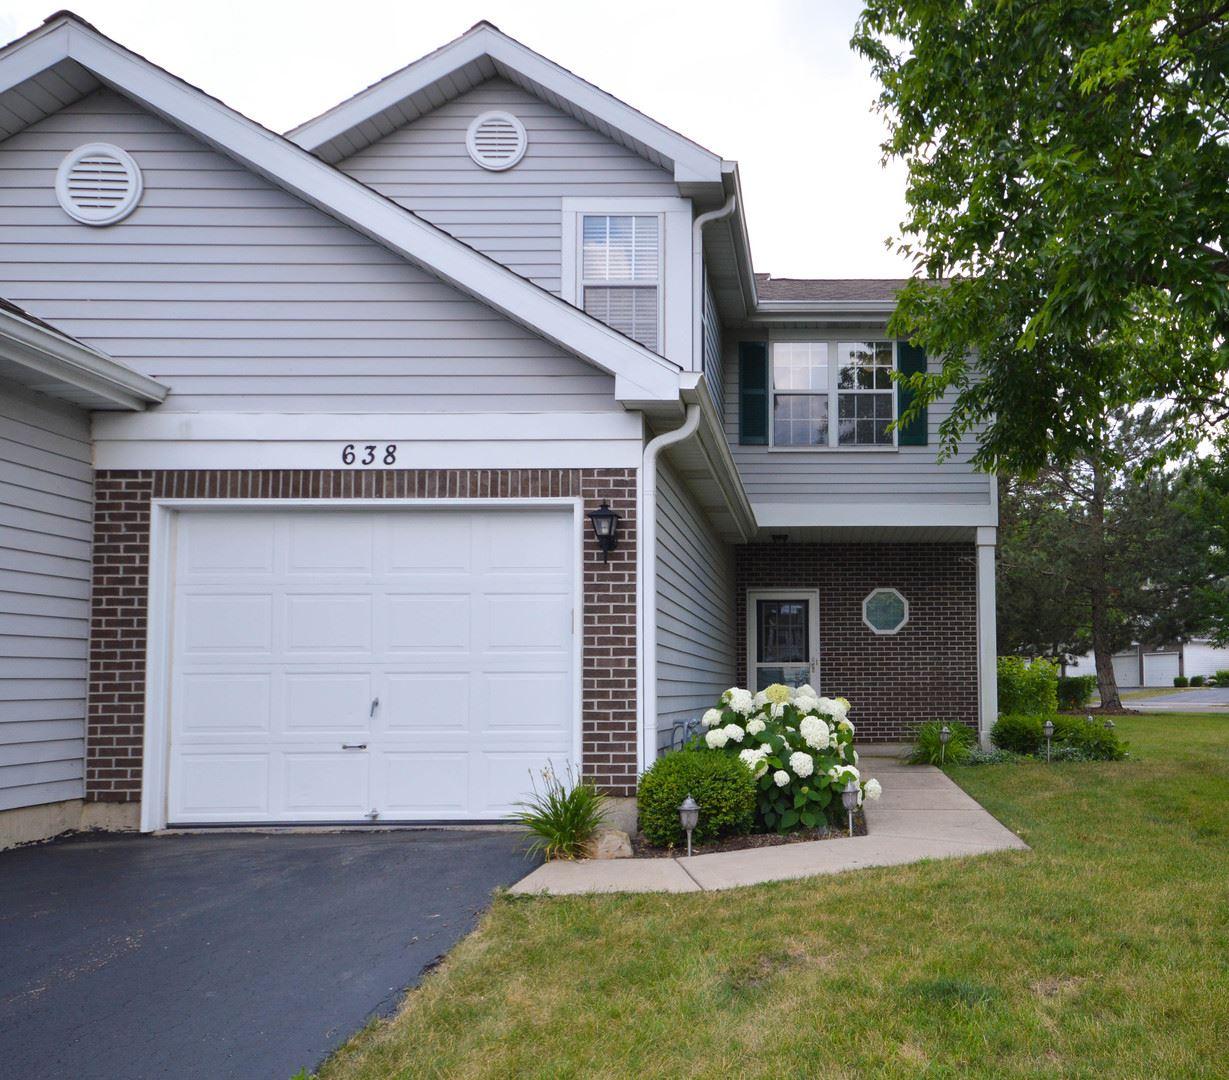 638 Woodhaven Drive, Mundelein, IL 60060 - #: 10765554